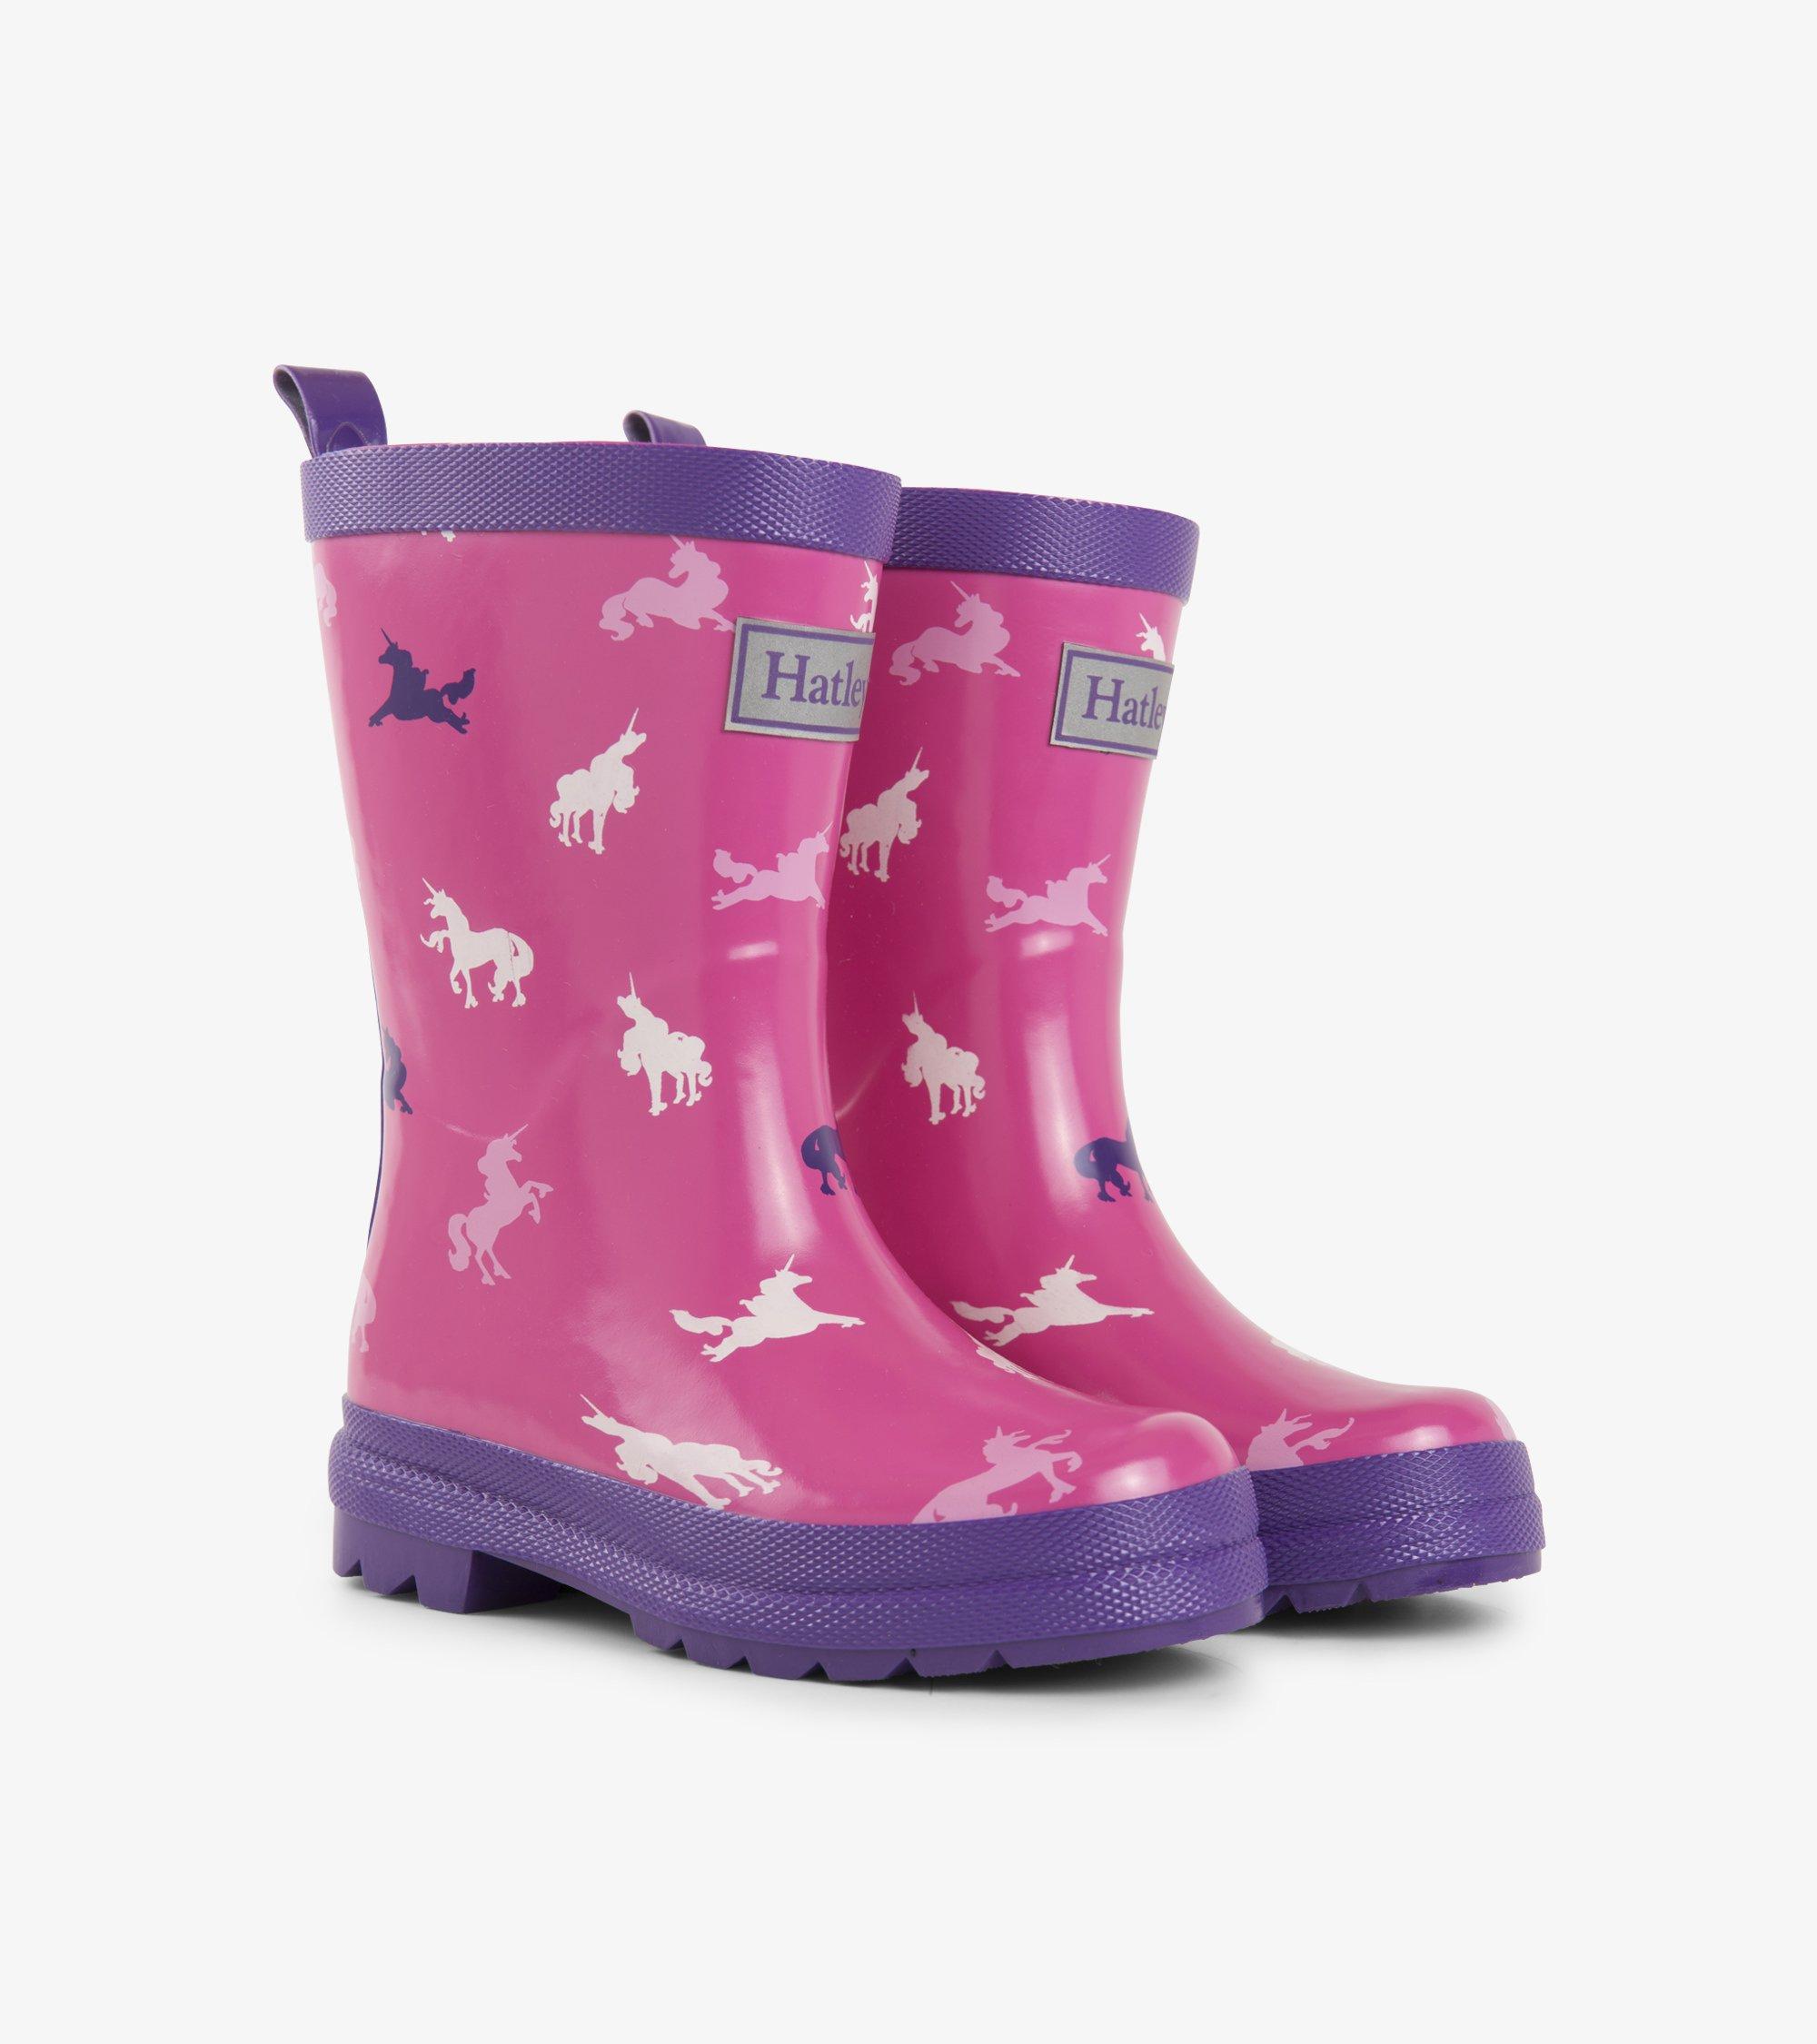 Hatley Girls' Printed Rain Boots, Unicorn Silhouettes, 13 M US Little Kid